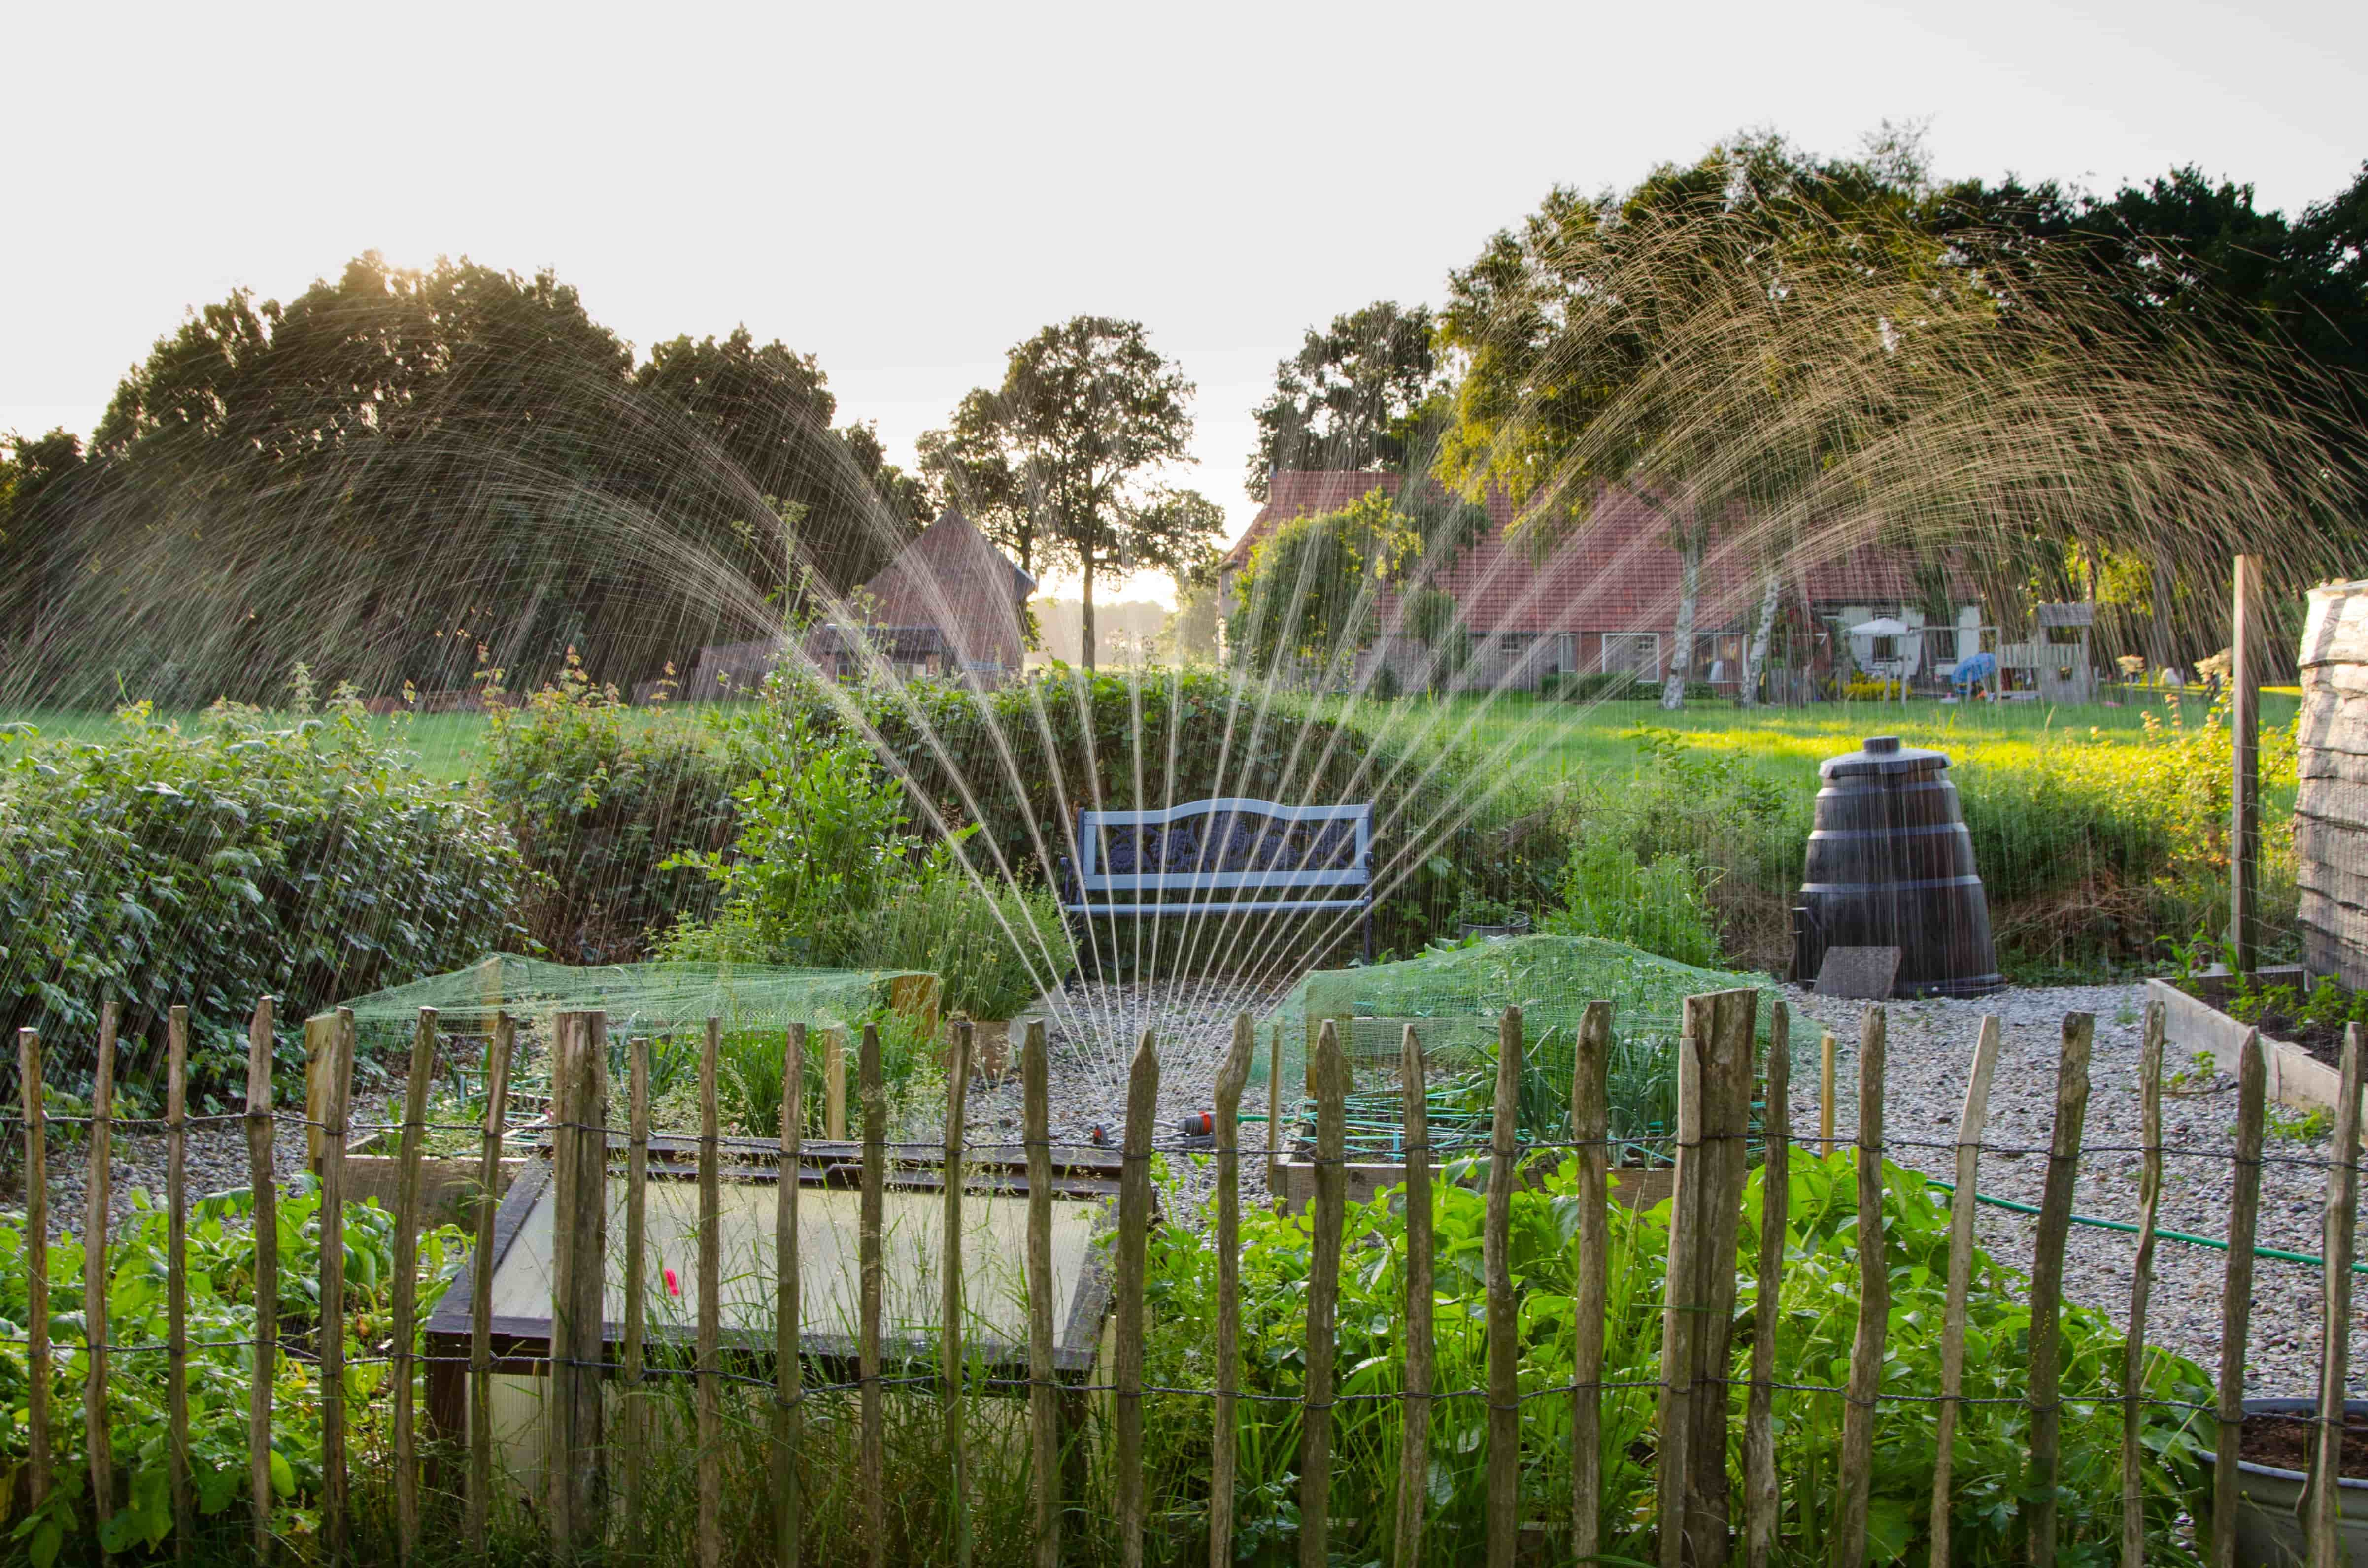 How Are Sprinkler Systems Designed?